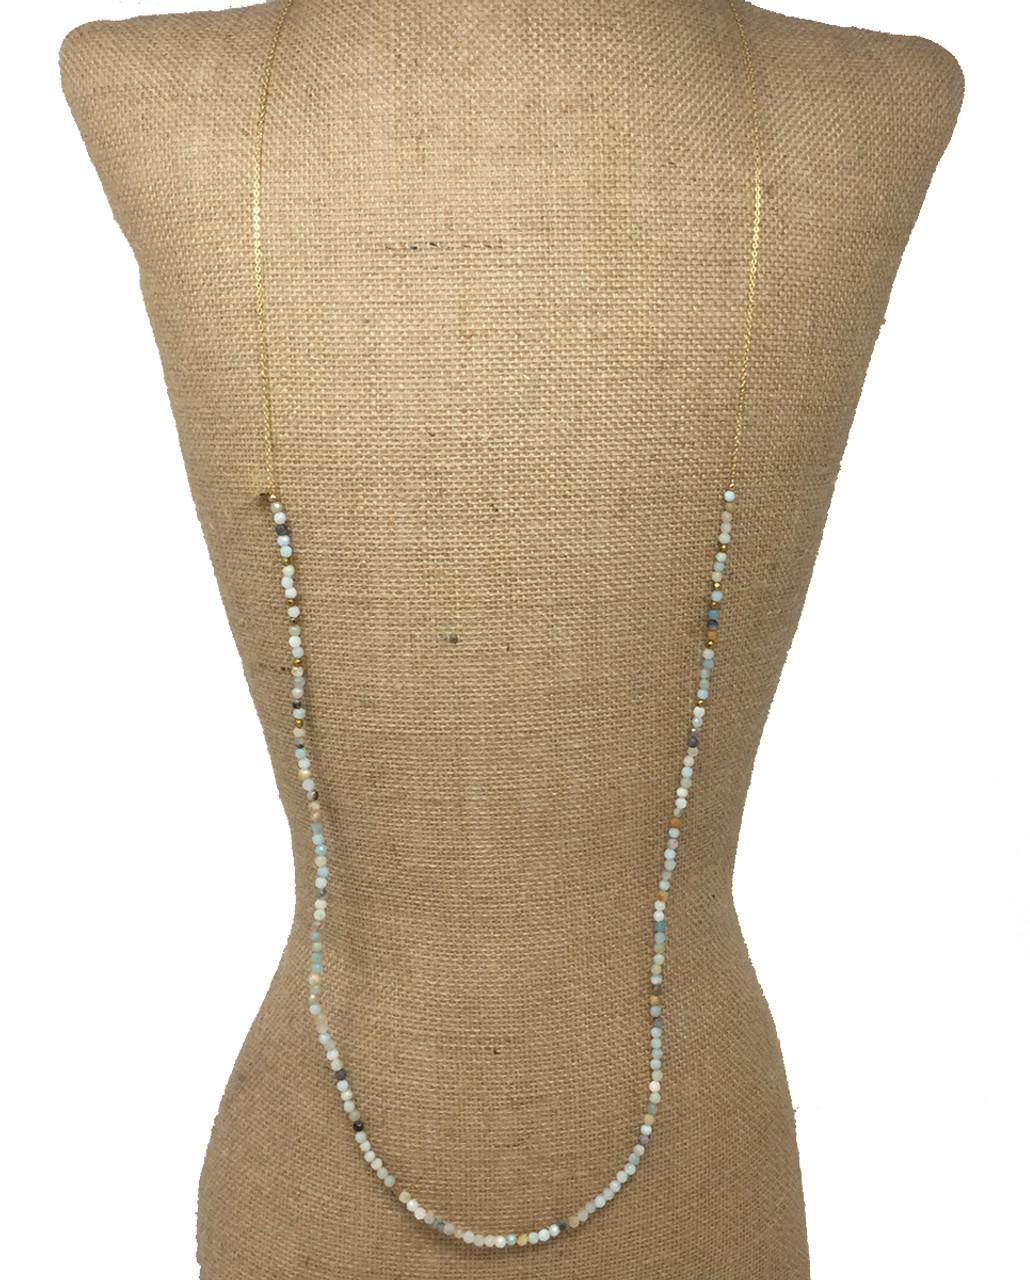 3d7de6bbf928c4 Betsy Pittard Designs Layering Dainty Necklace, Mixed Neutrals - Trenz  Shirt Company